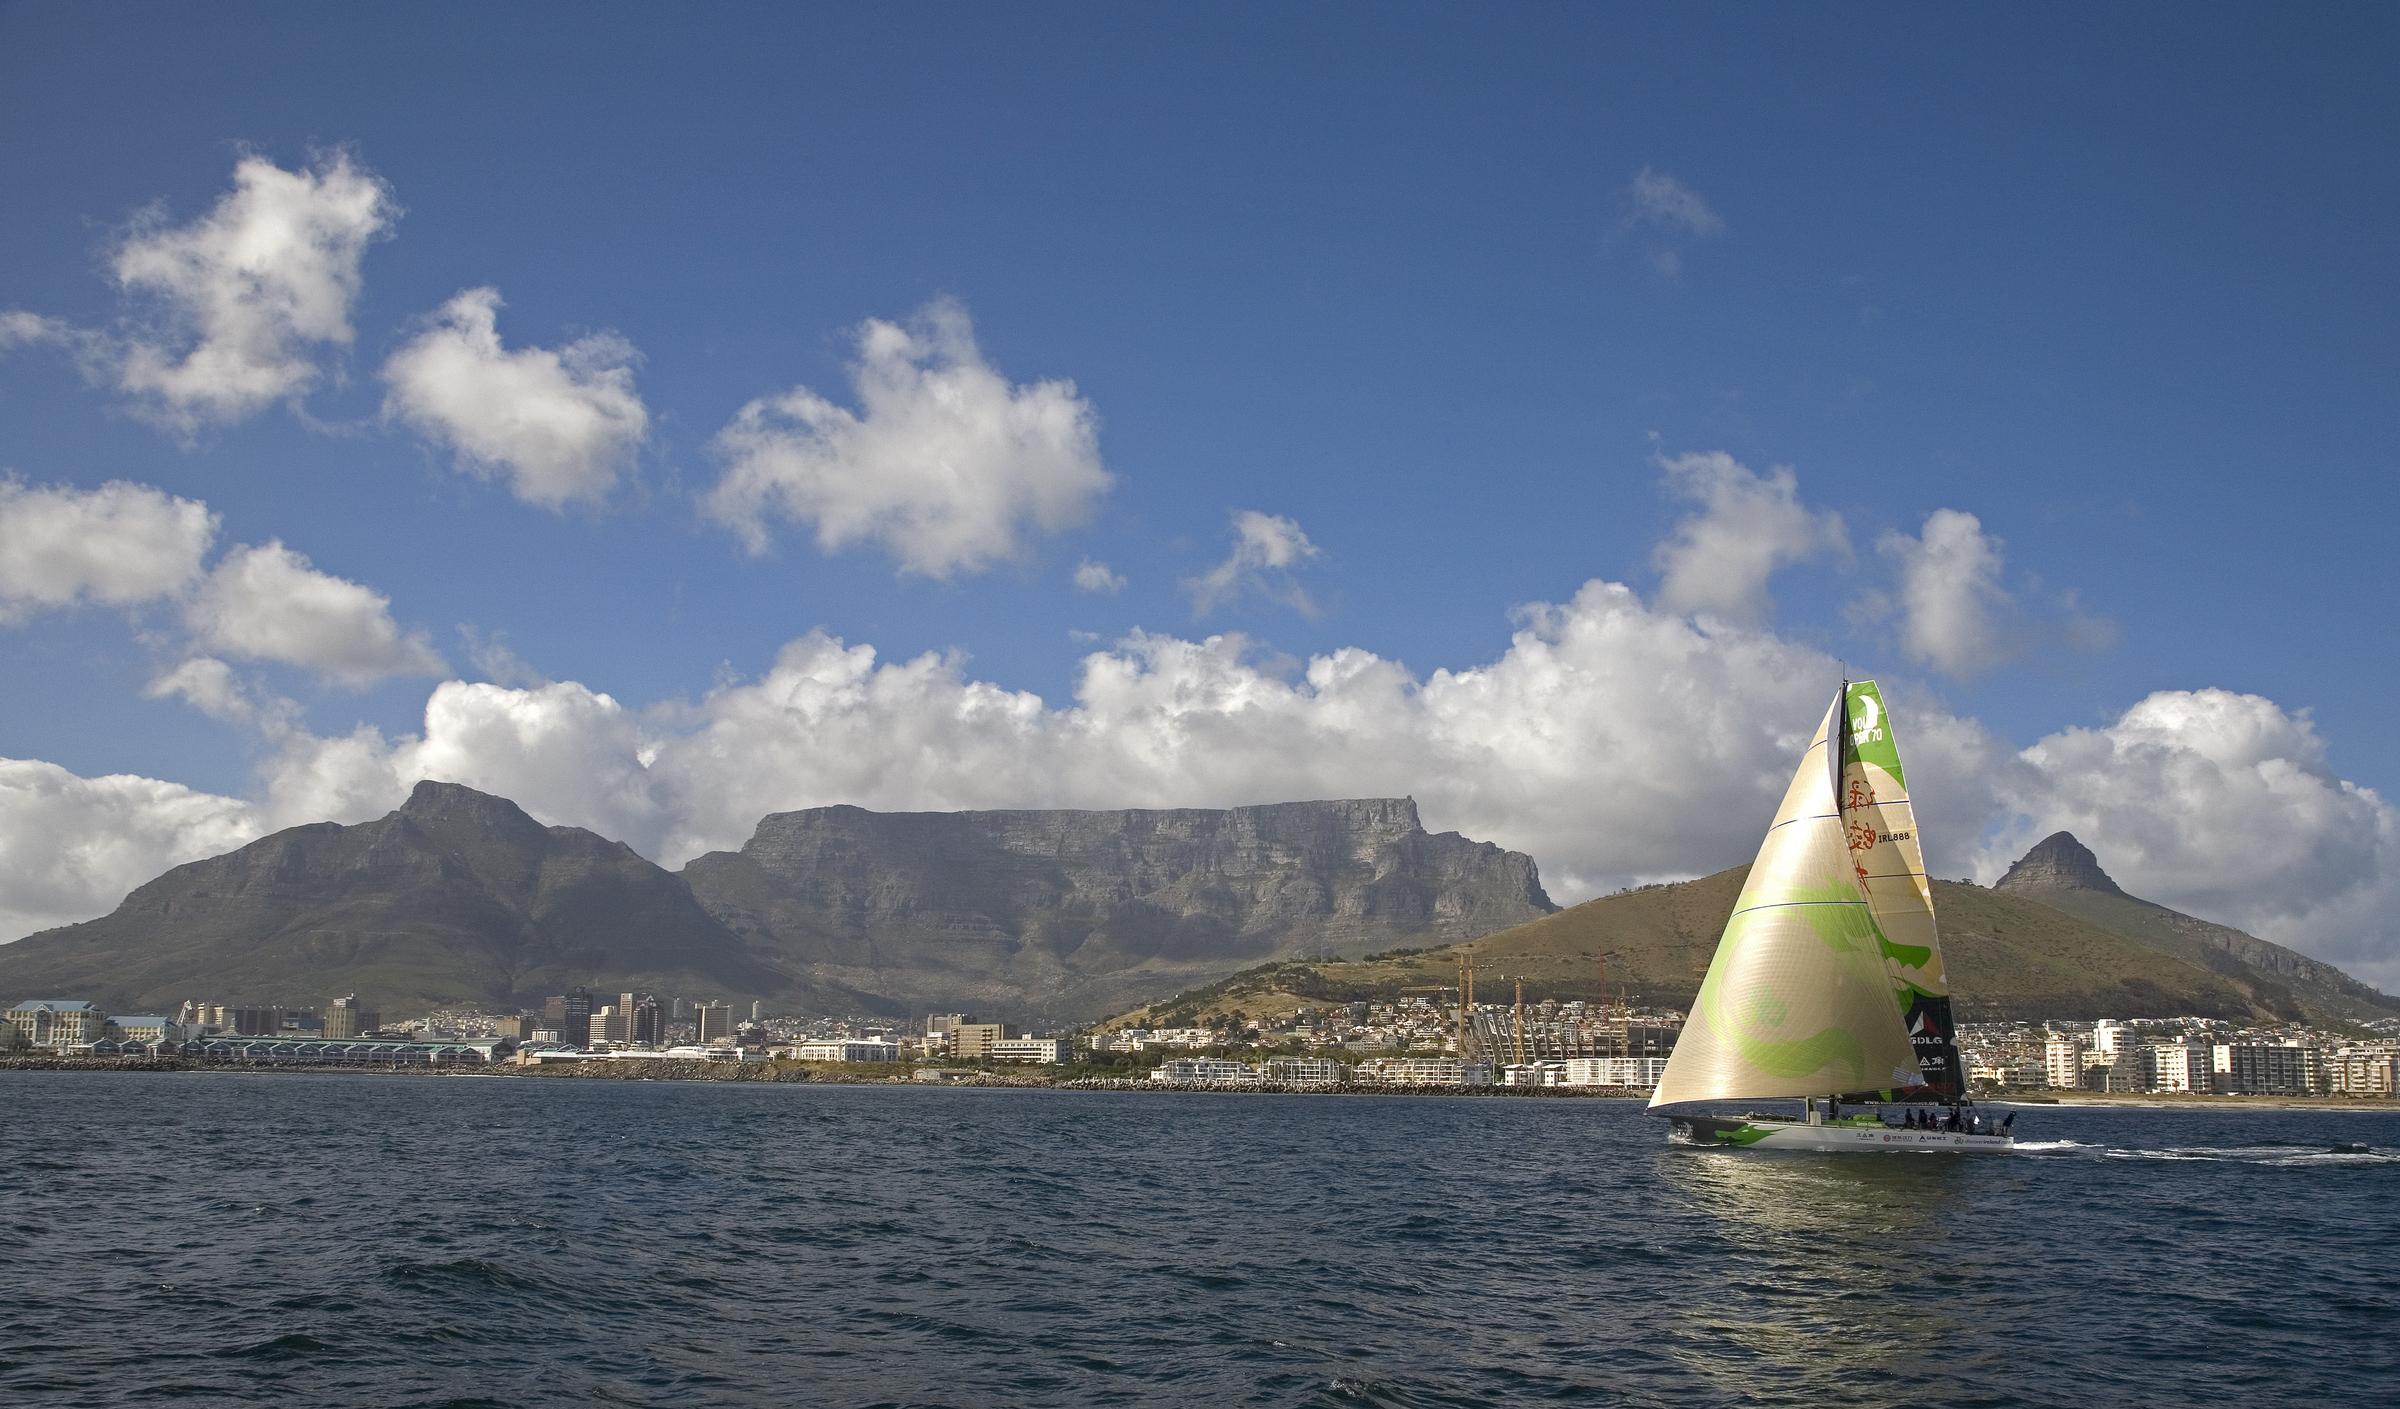 HeraldScotland: Green Dragon arrives in Cape Town. Photo: Oceansport